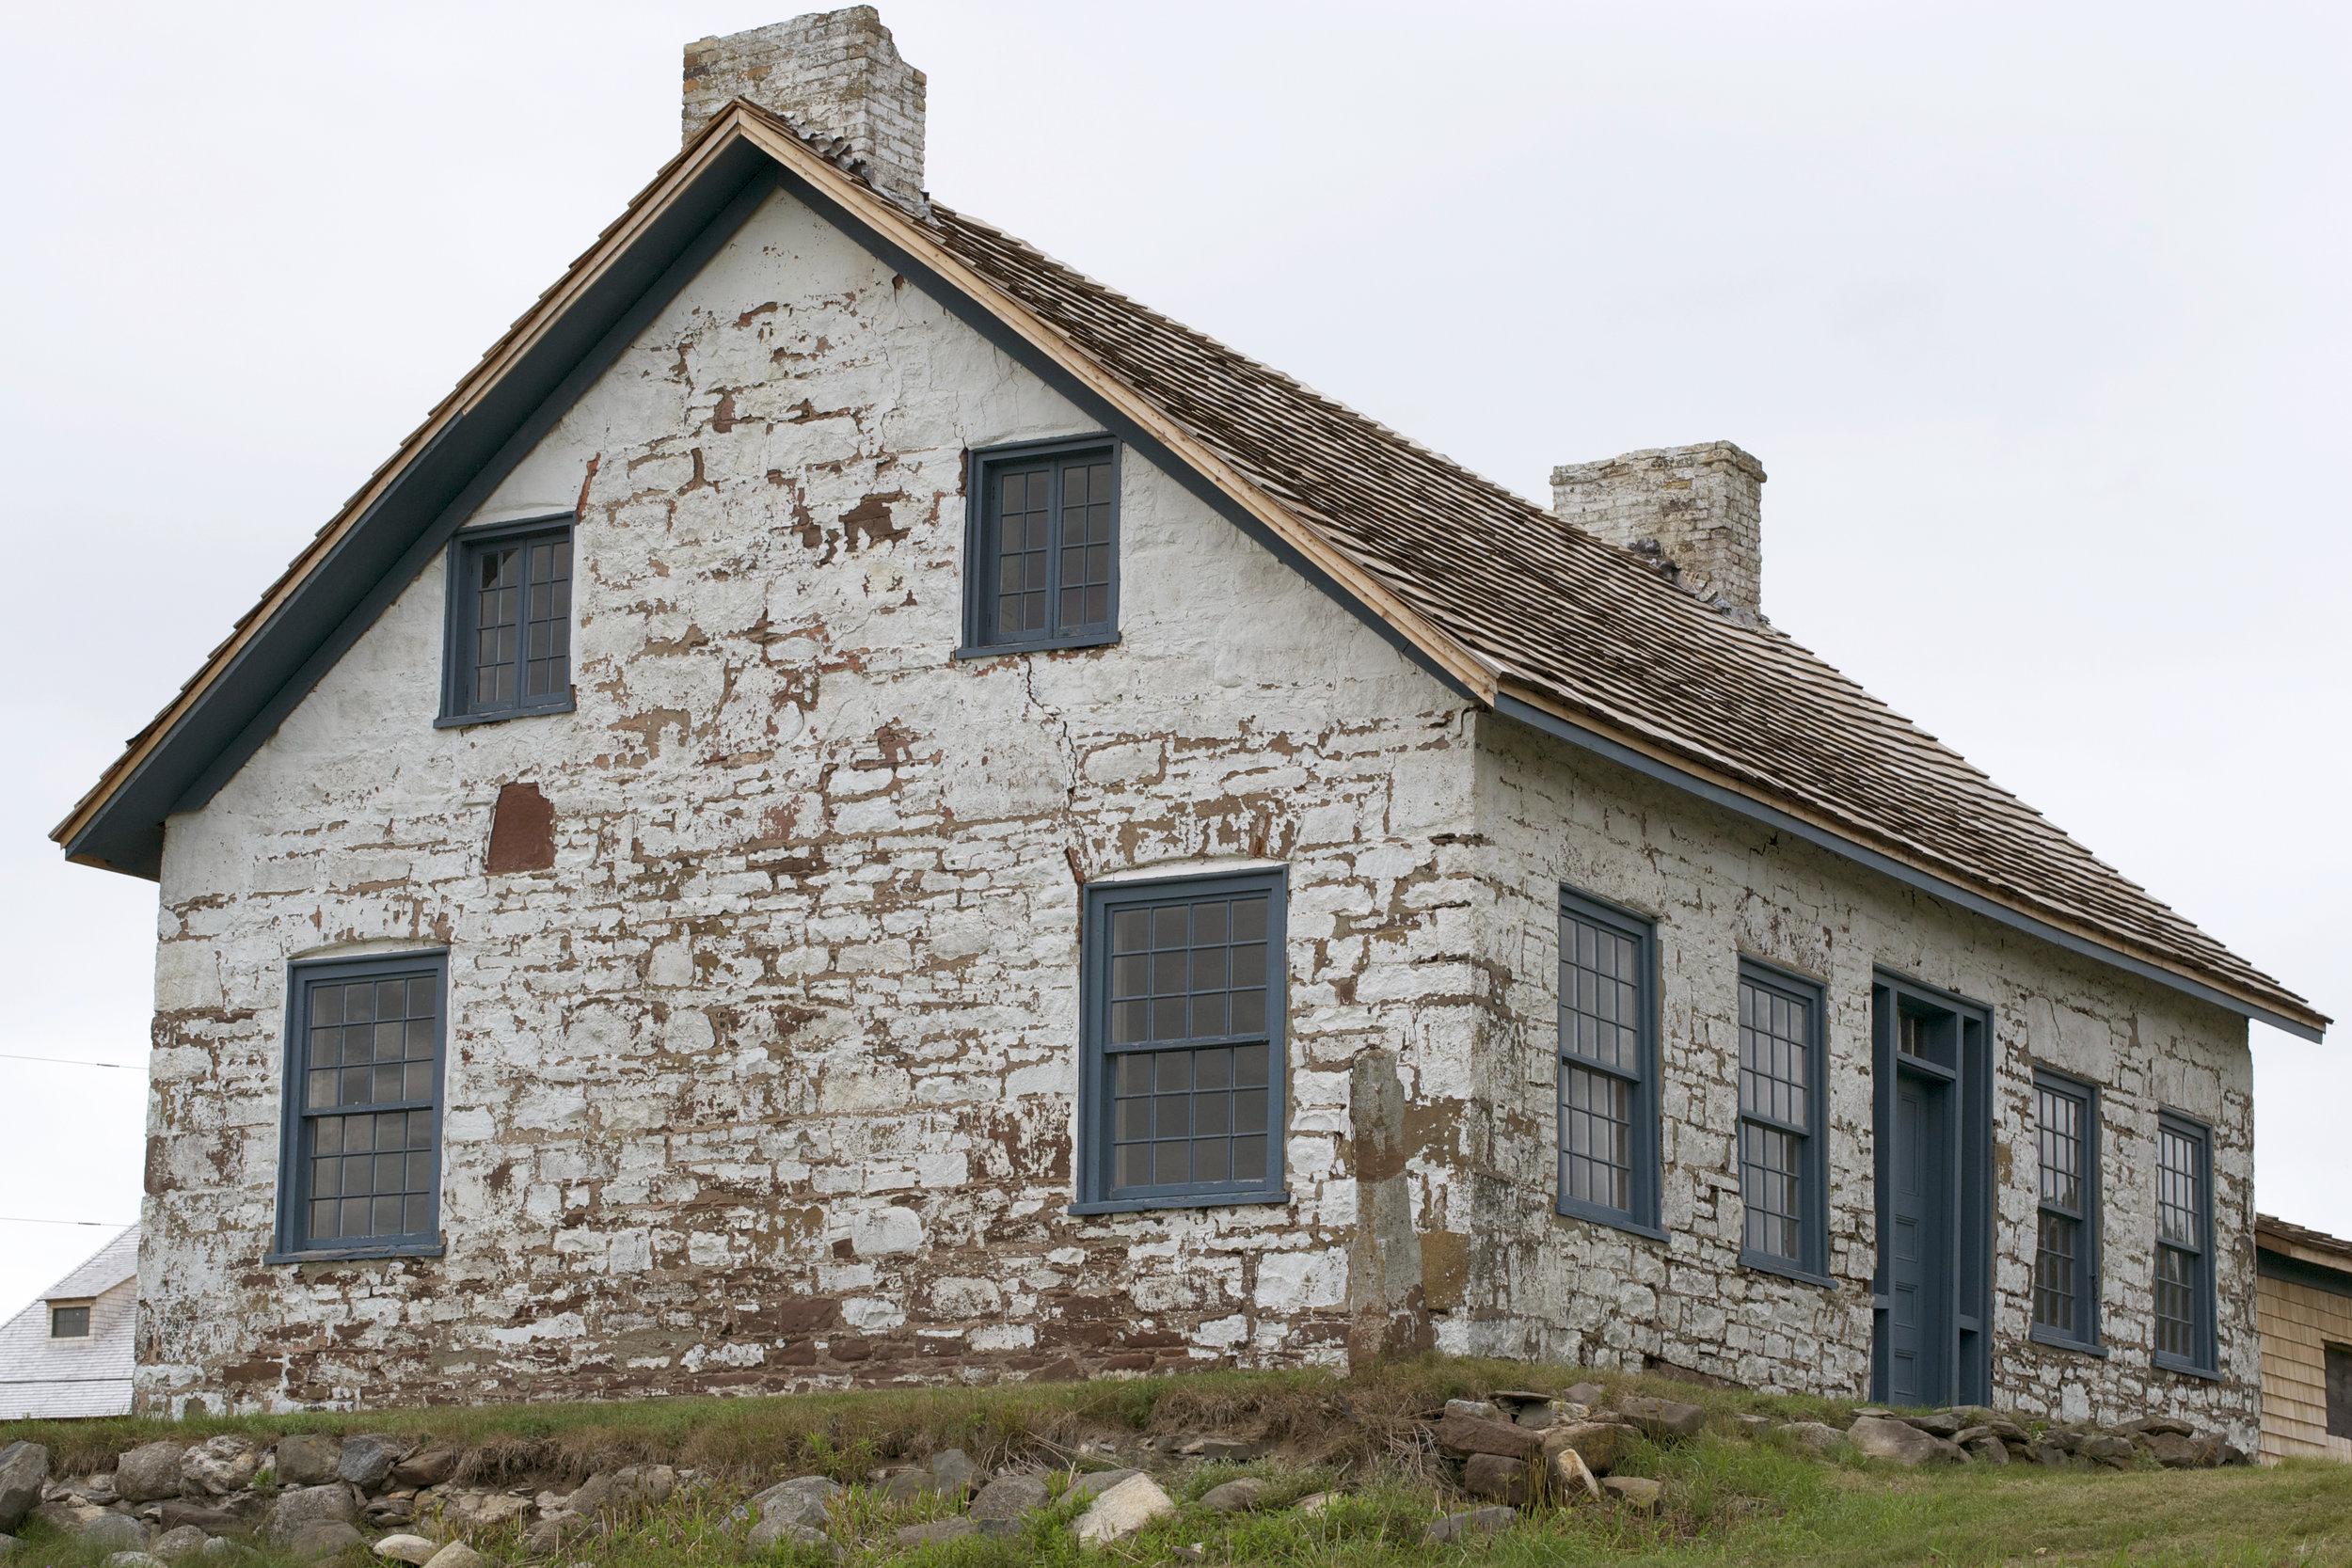 old-stone-house.jpg